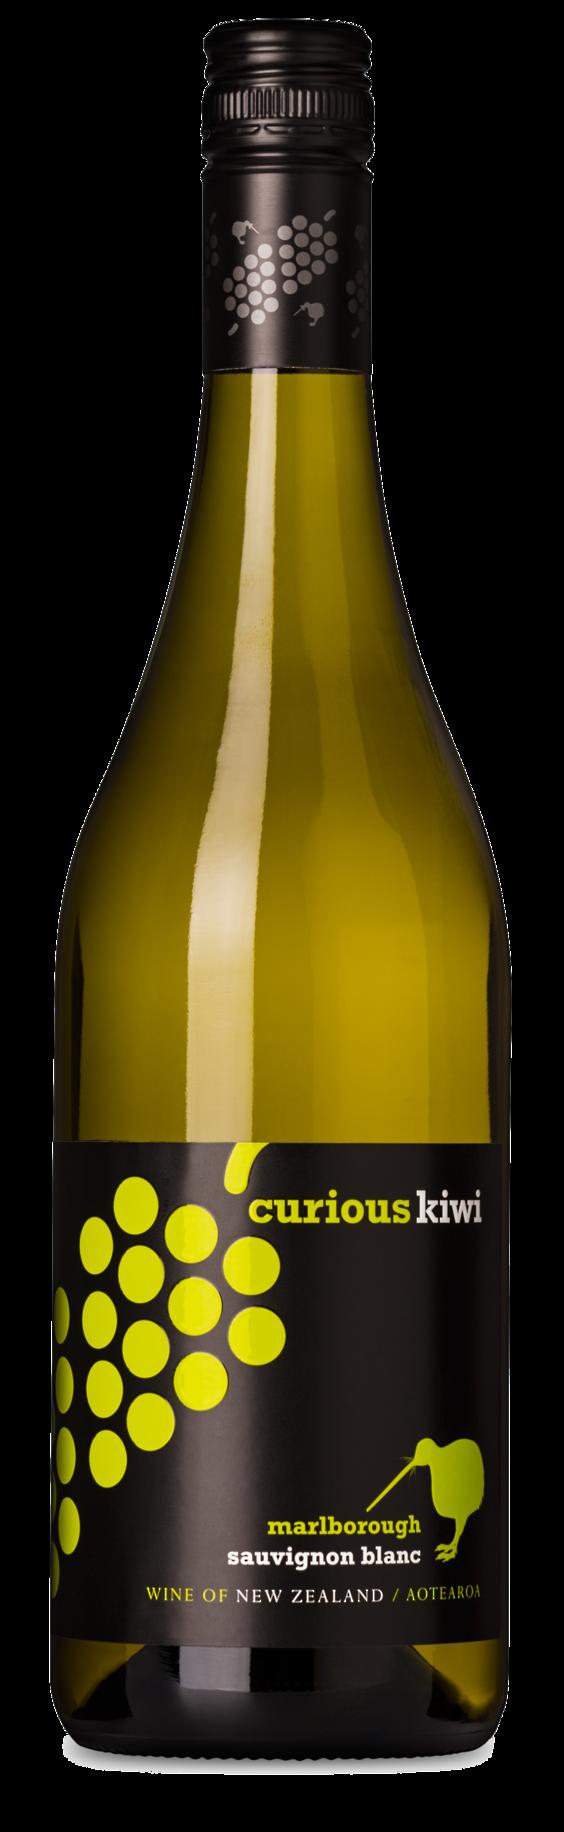 Curious Kiwi Sauvignon Blanc 2020 image 0